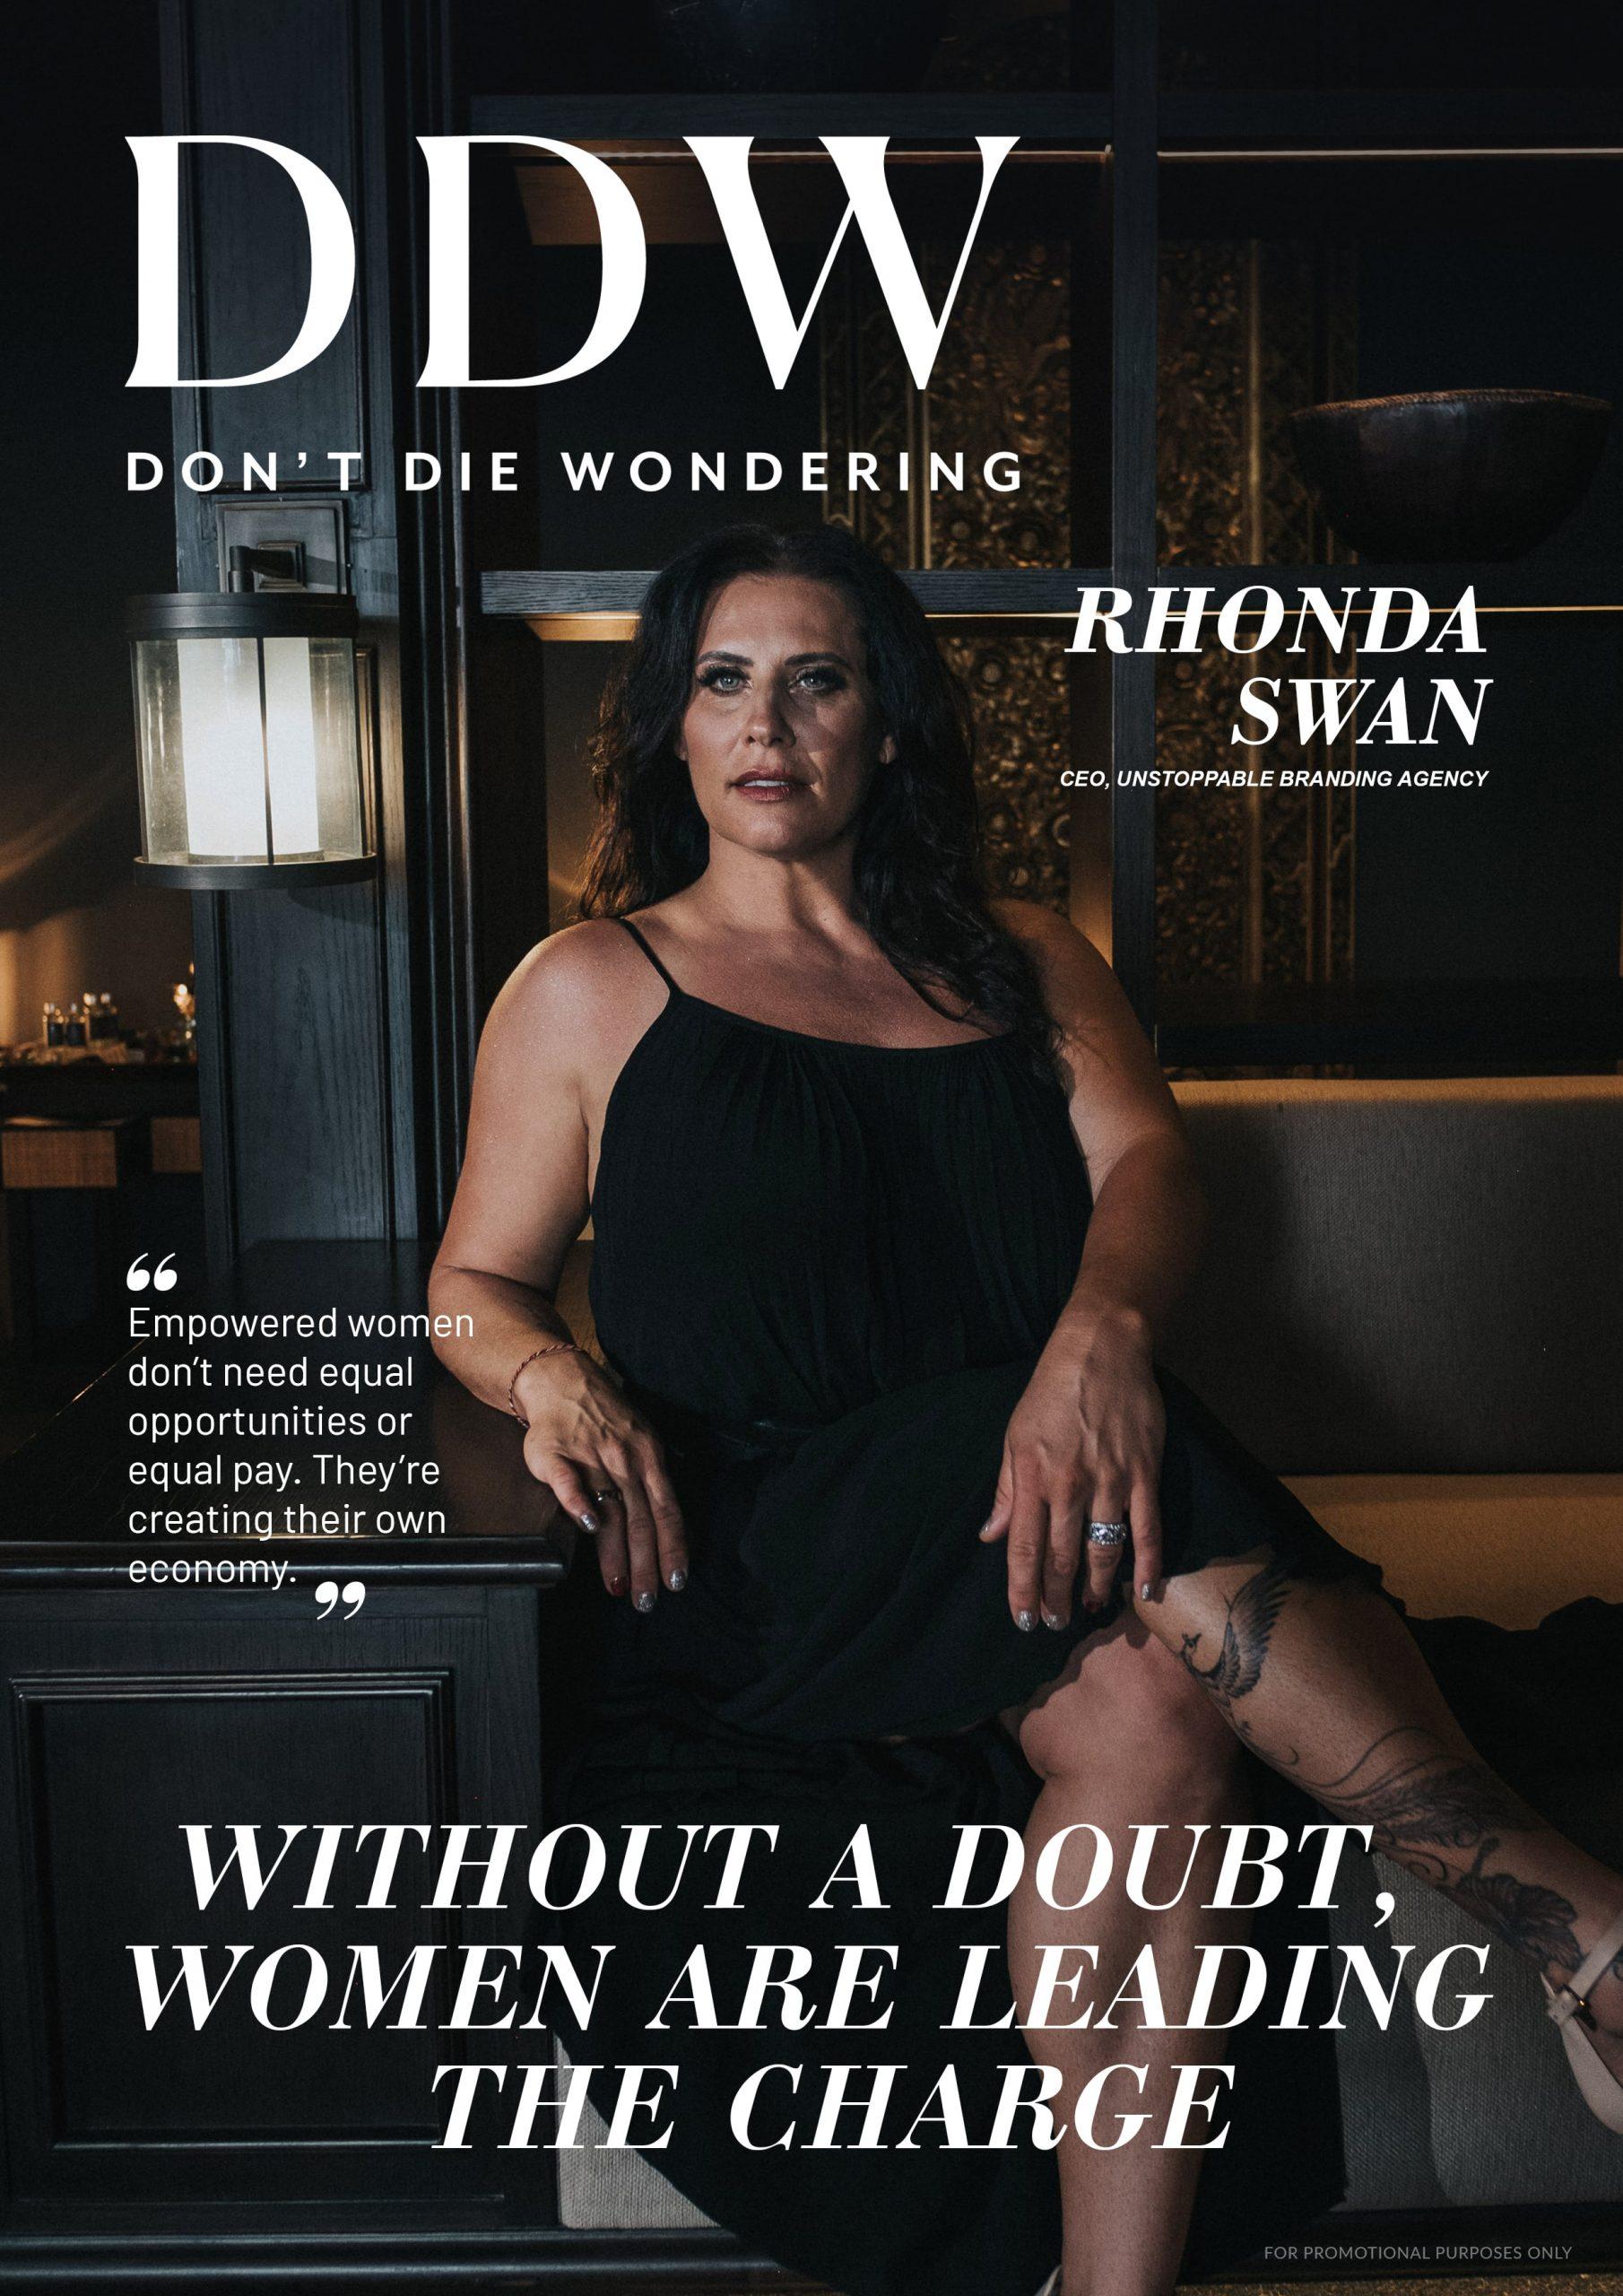 Rhonda Swan (DDW Cover)-min